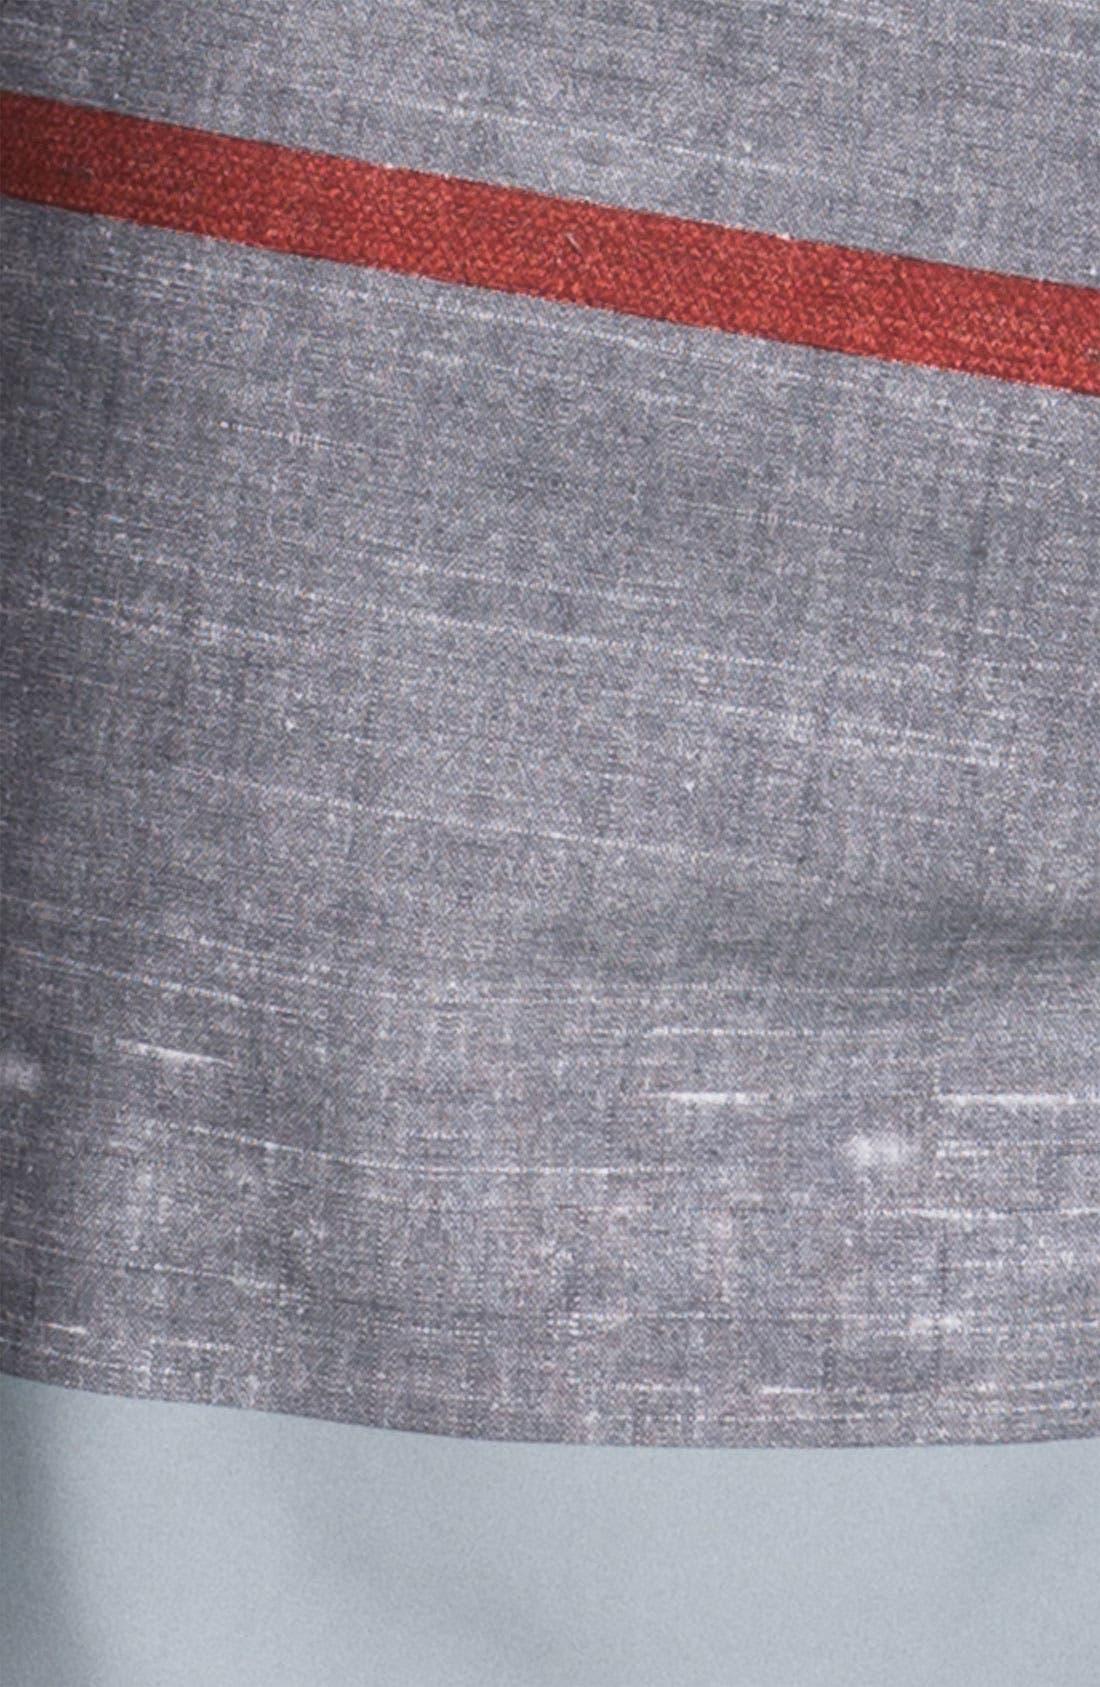 Alternate Image 3  - Quiksilver 'Cruzcash' Shorts